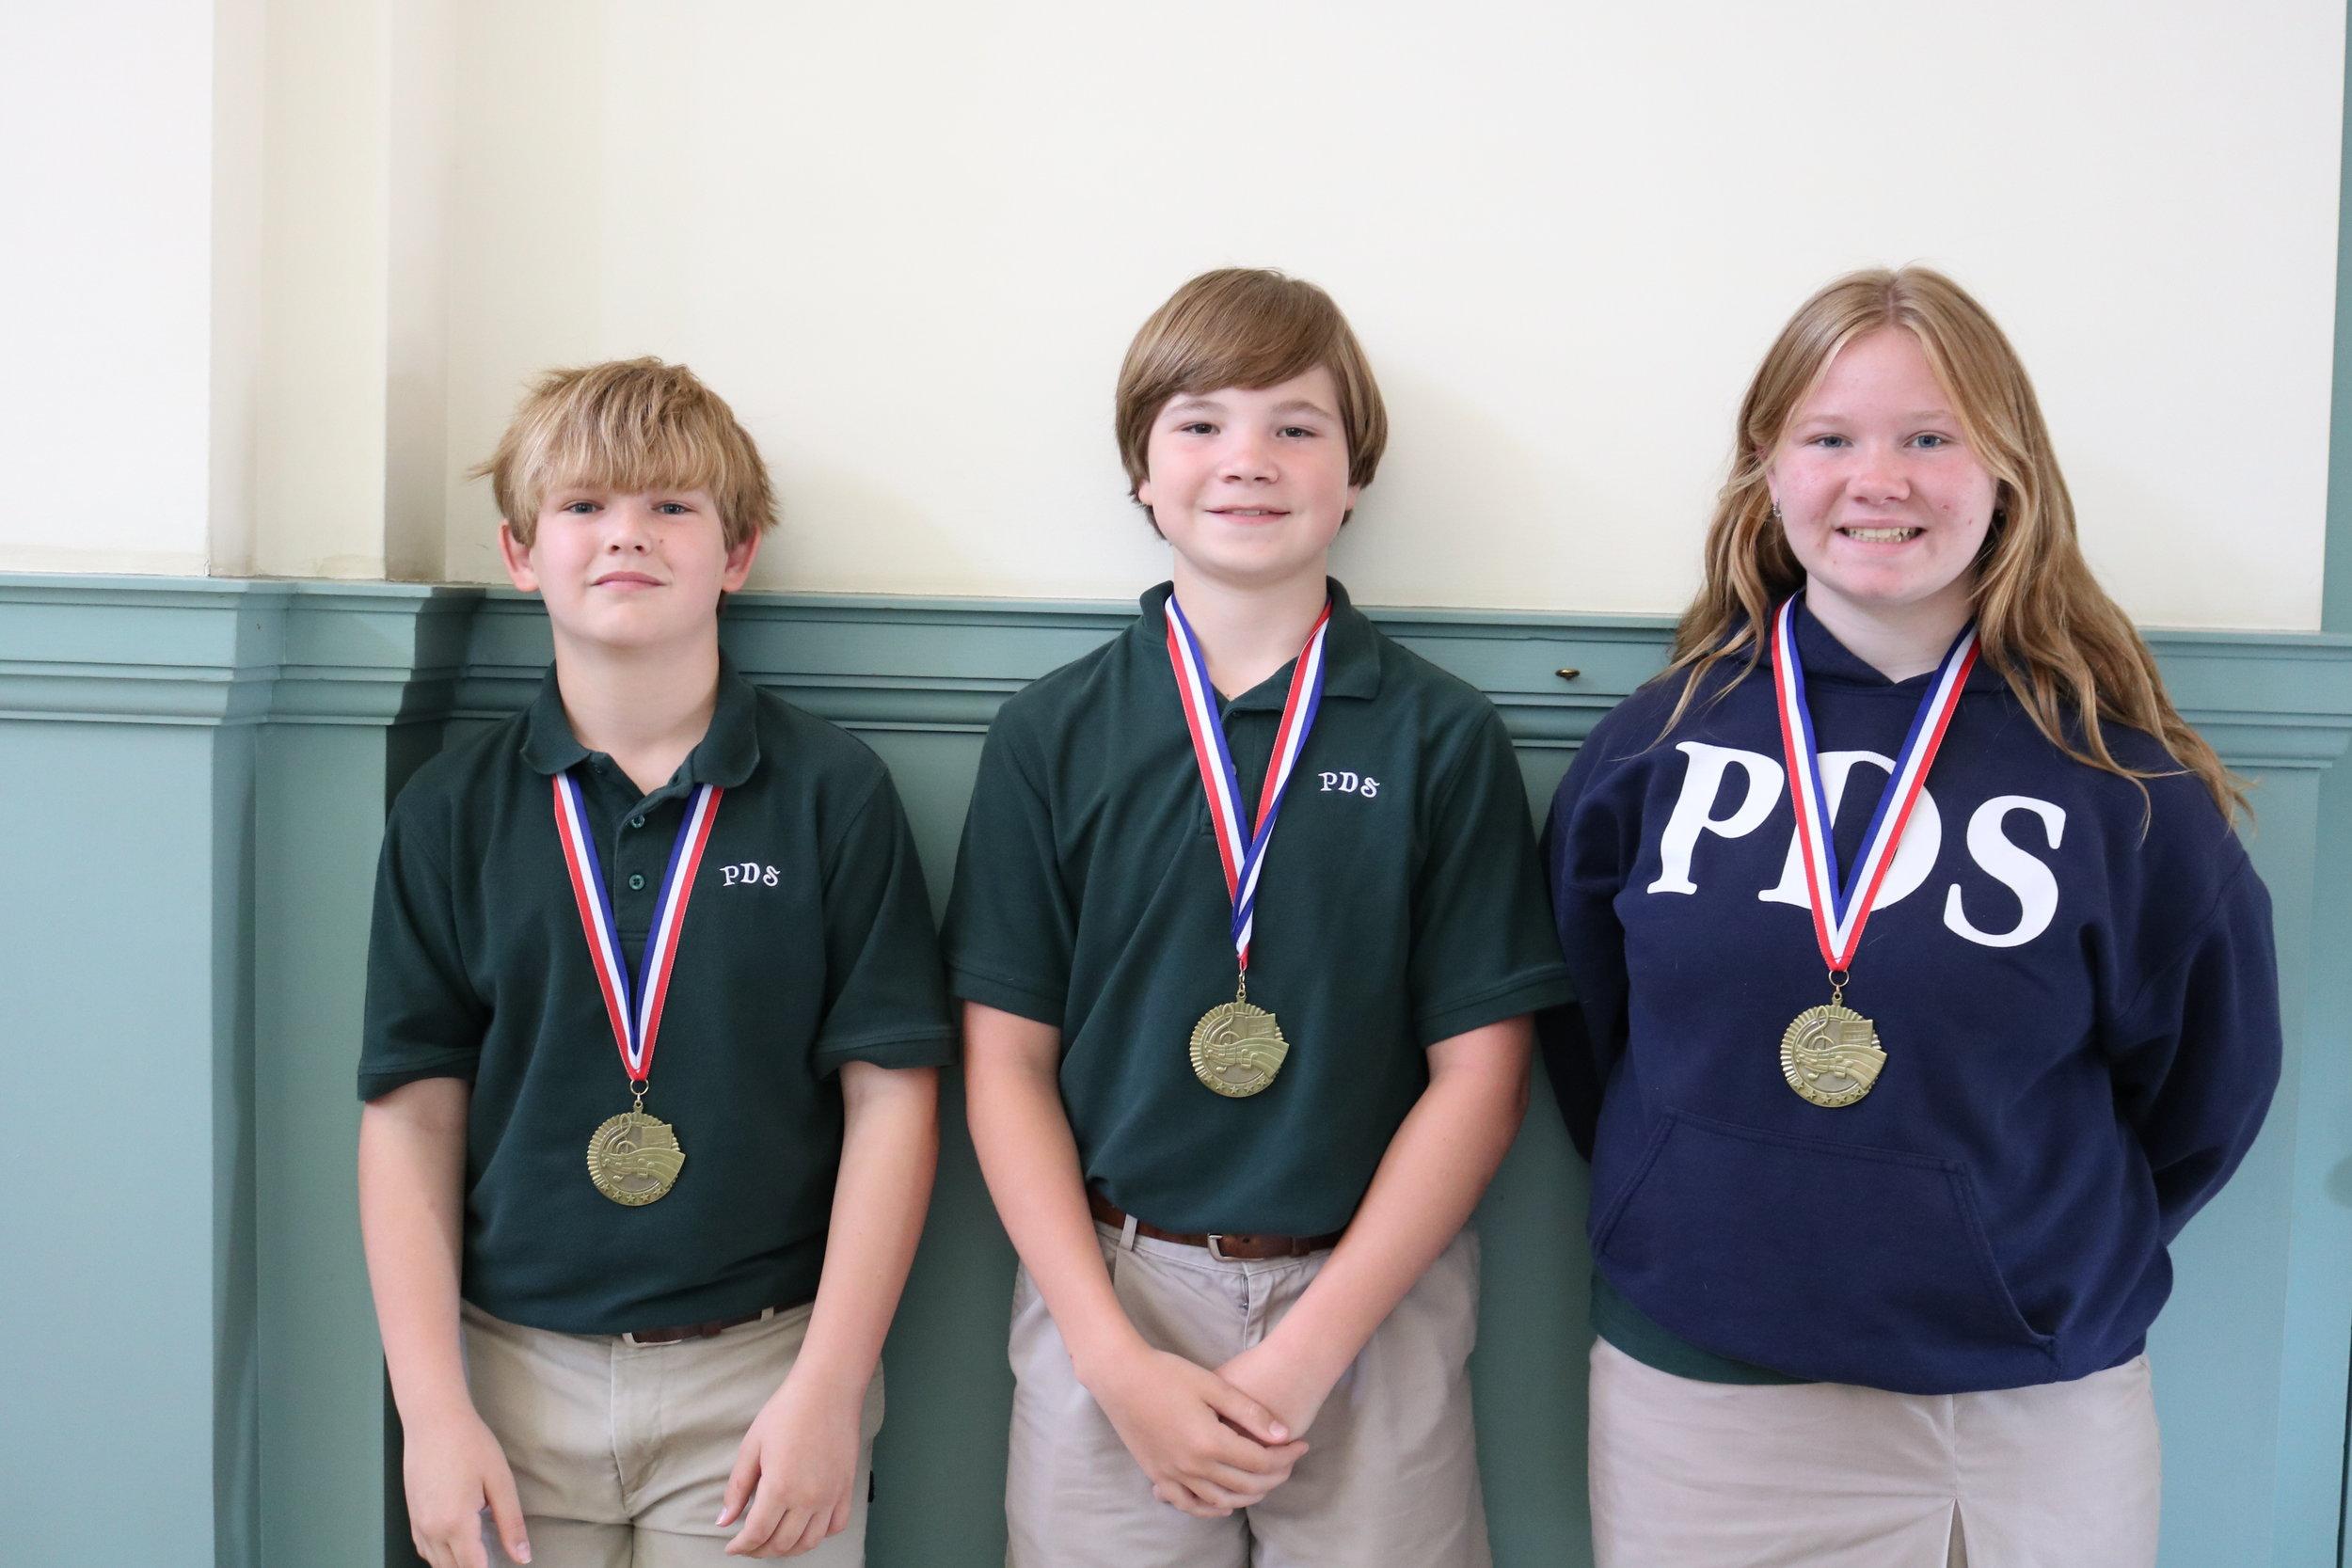 5th grade Music Medallion Award winners